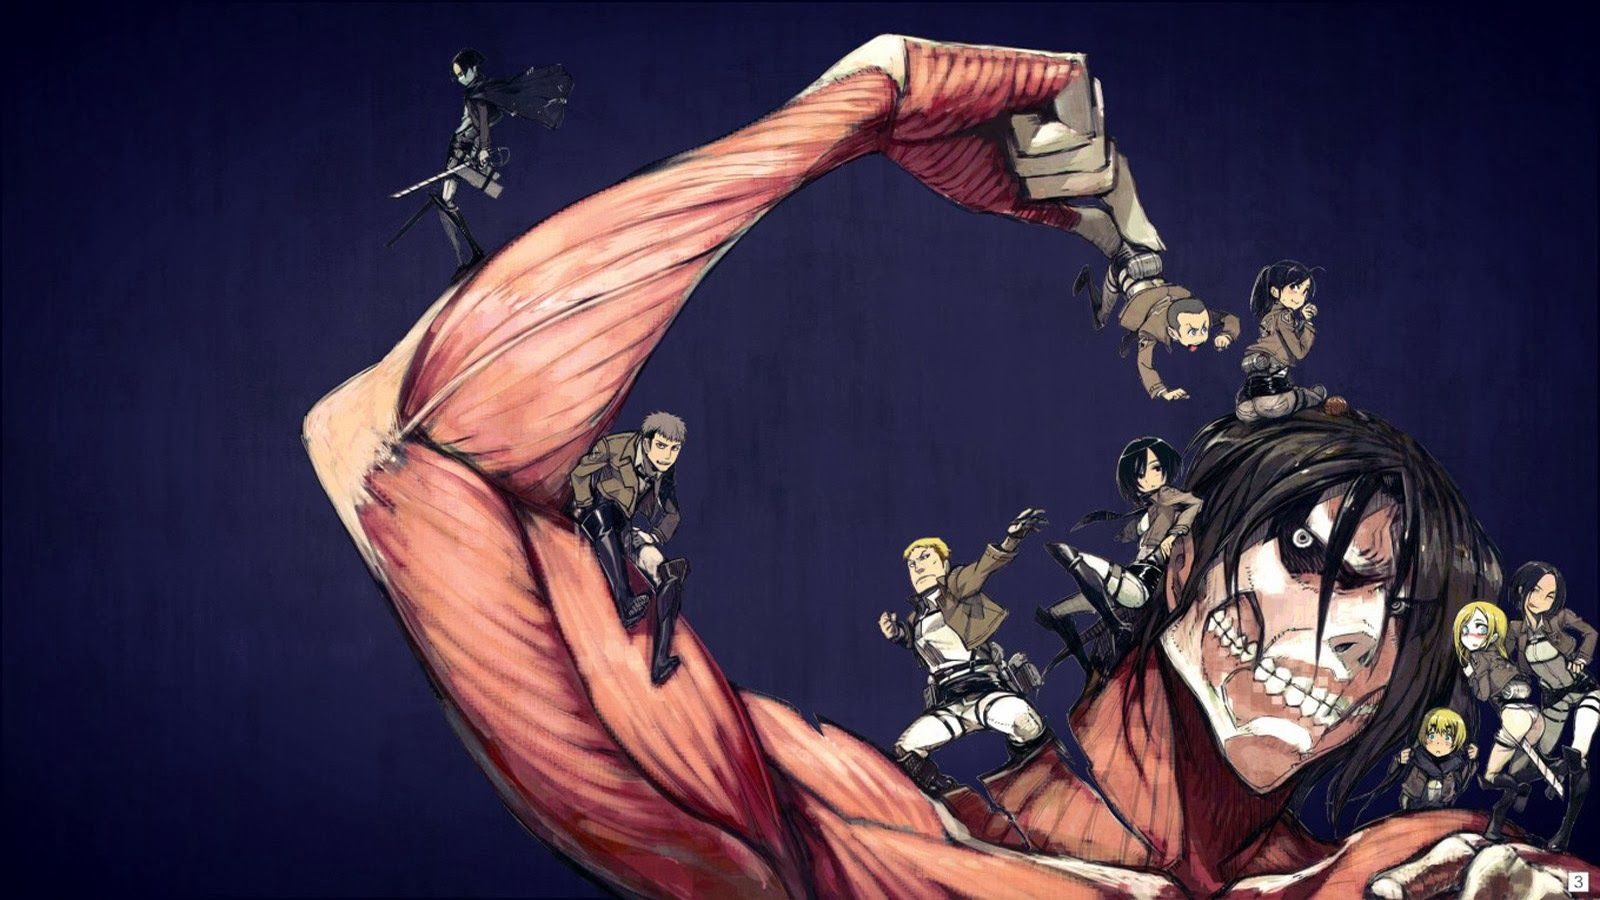 Pin By Spongbob Square Pants On Shingeki No Kyojin Attack On Titan Character Wallpaper Attack On Titan Anime